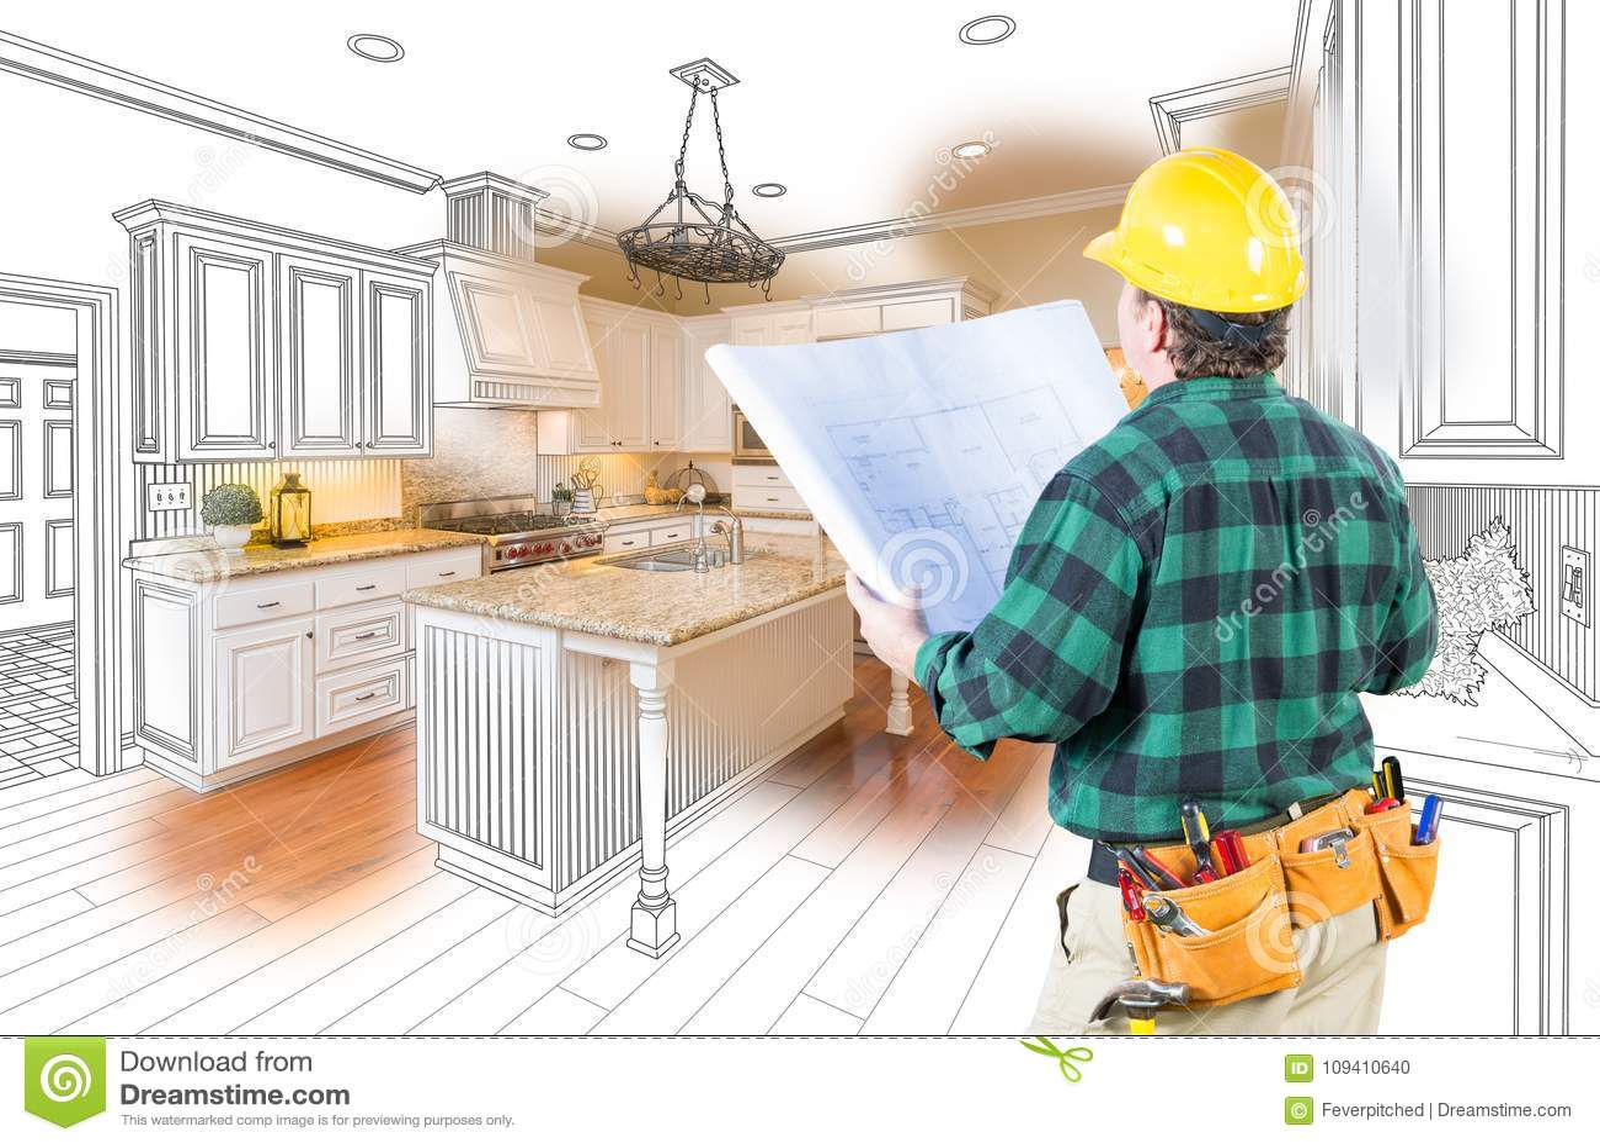 kitchen contractor laminate countertop 与安全帽和计划的公承包商看习惯厨房库存例证 插画包括有里面 自定义 与安全帽和计划的公承包商看习惯厨房